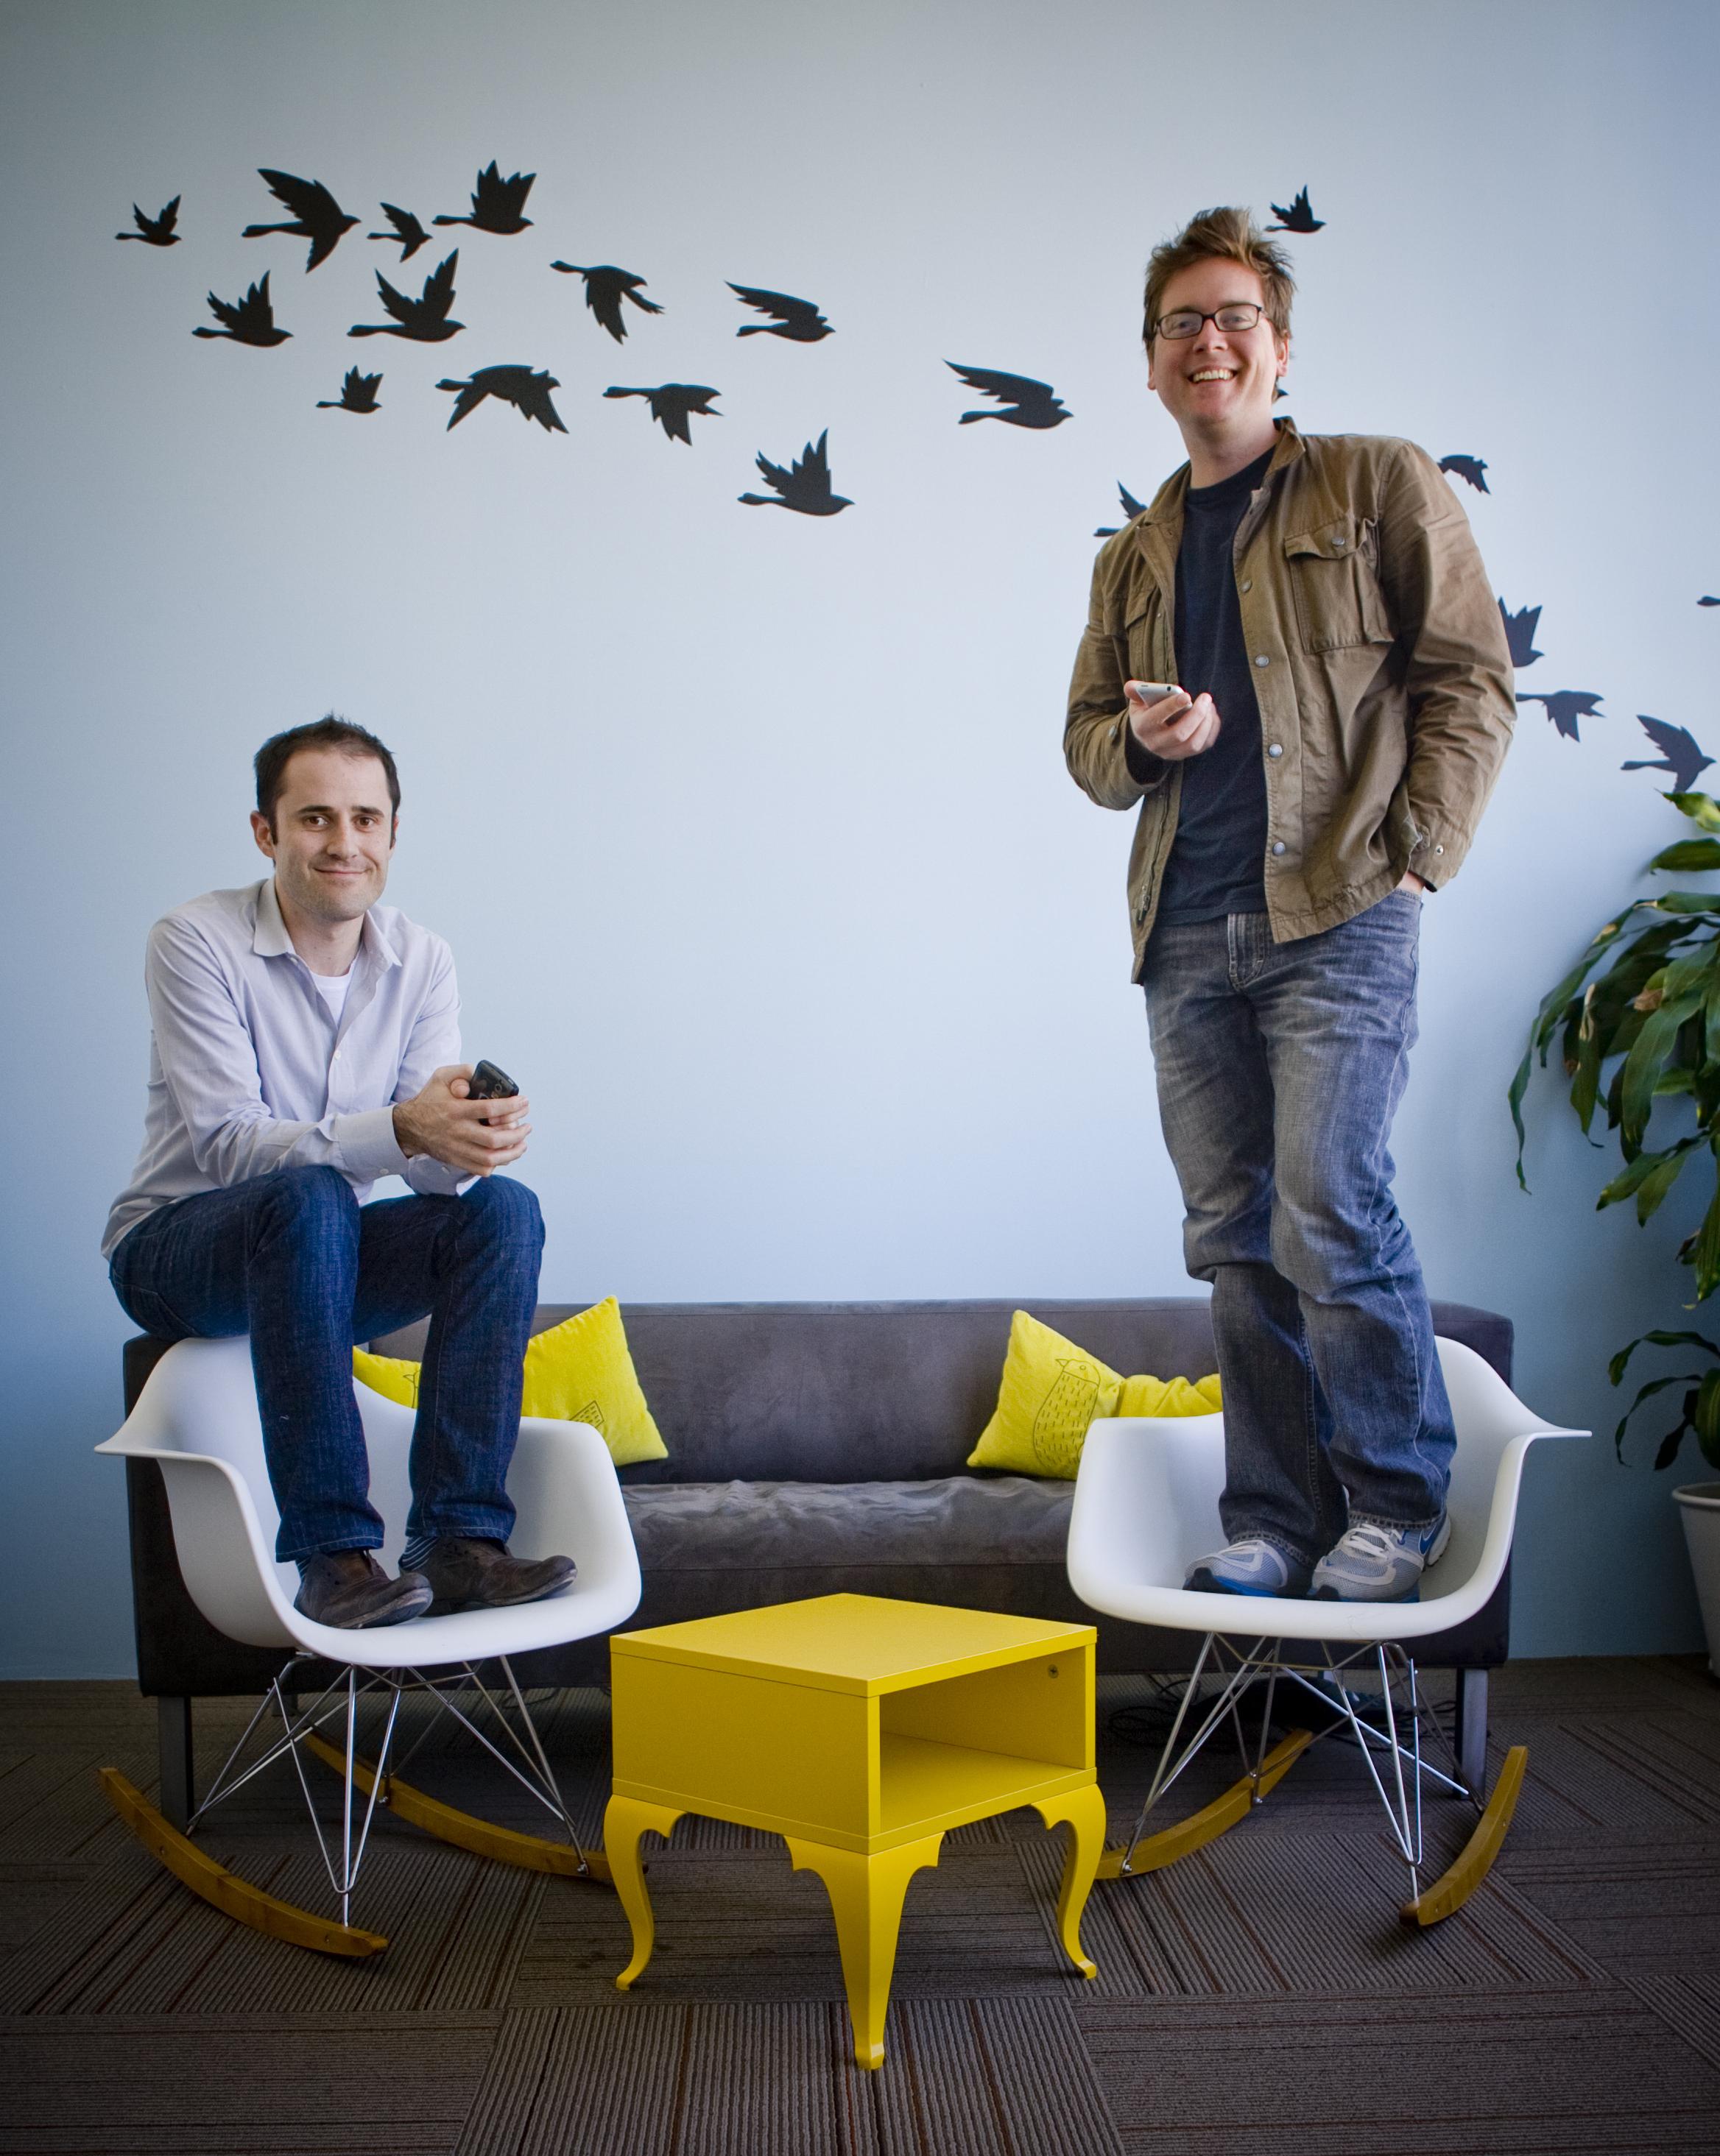 Evan Williams & Biz Stone - Twitter co-founders